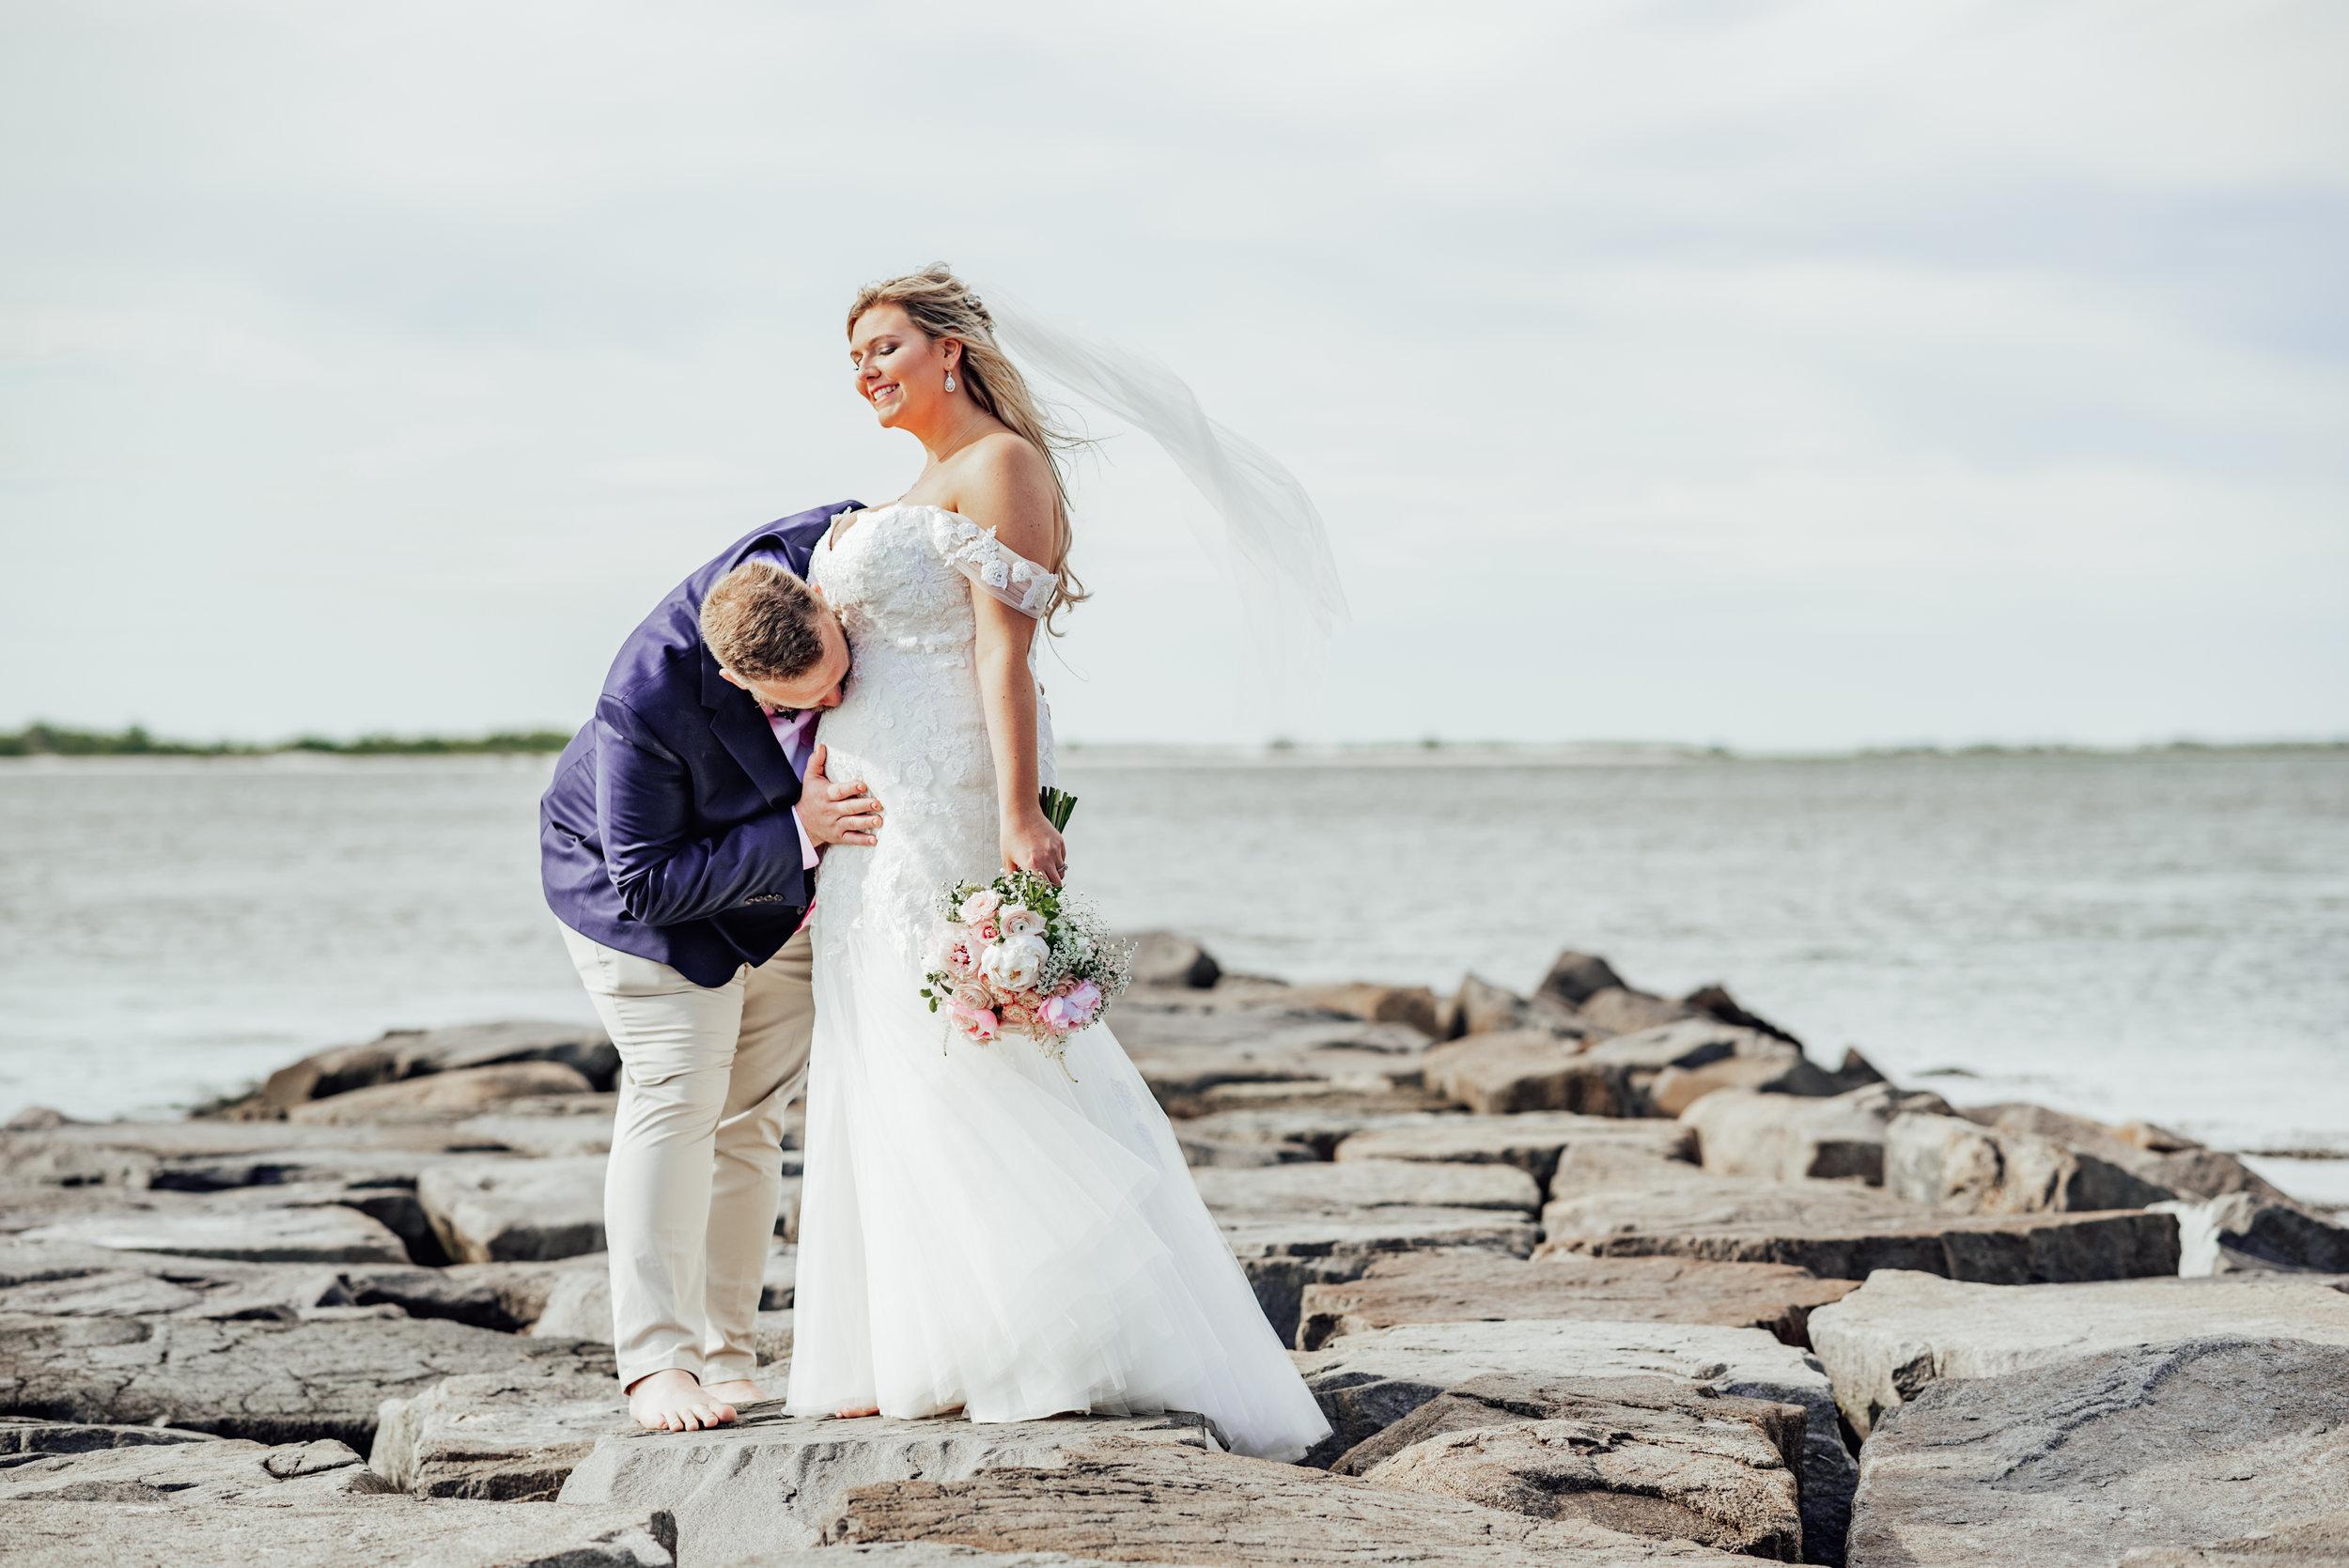 New Jersey Wedding Photographer, Felsberg Photography LBI wedding photography 81.jpg